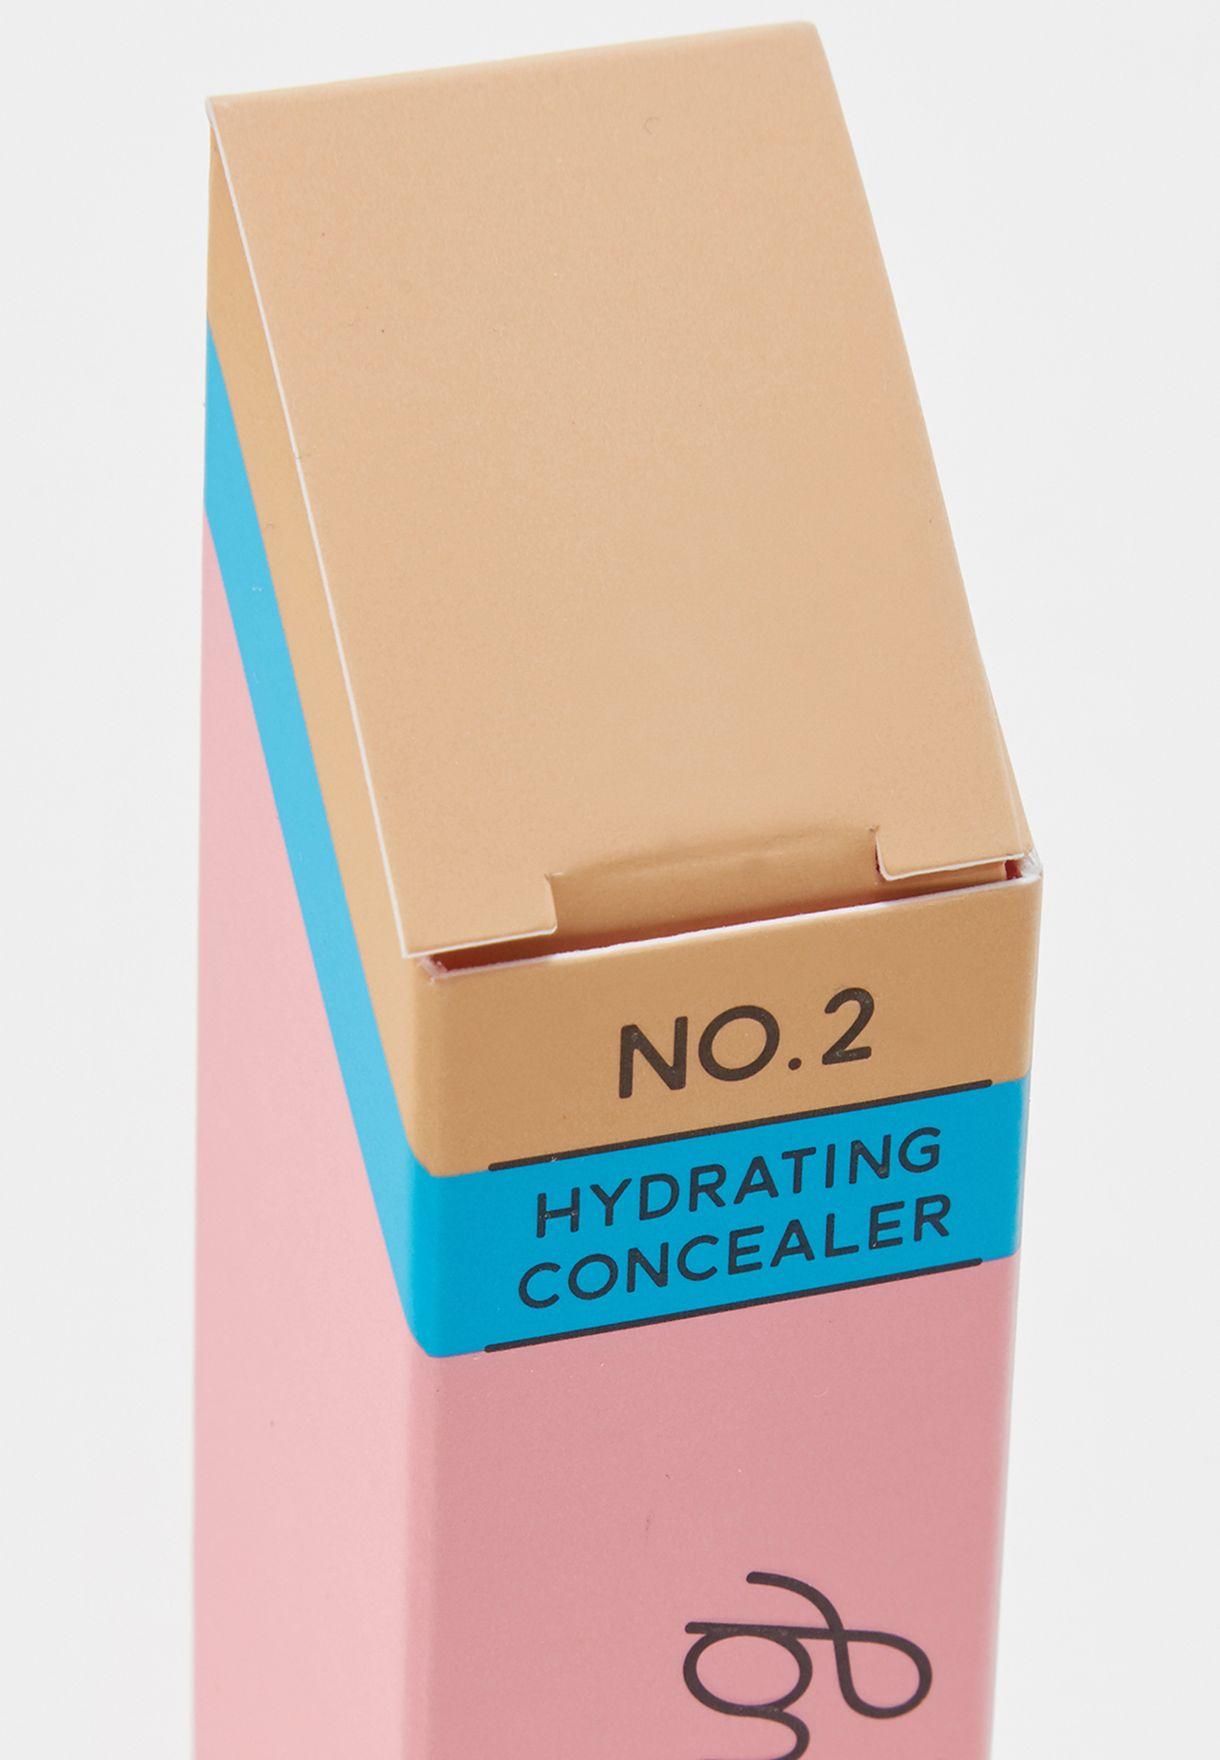 Boi-Ing Hydrating Concealer #02